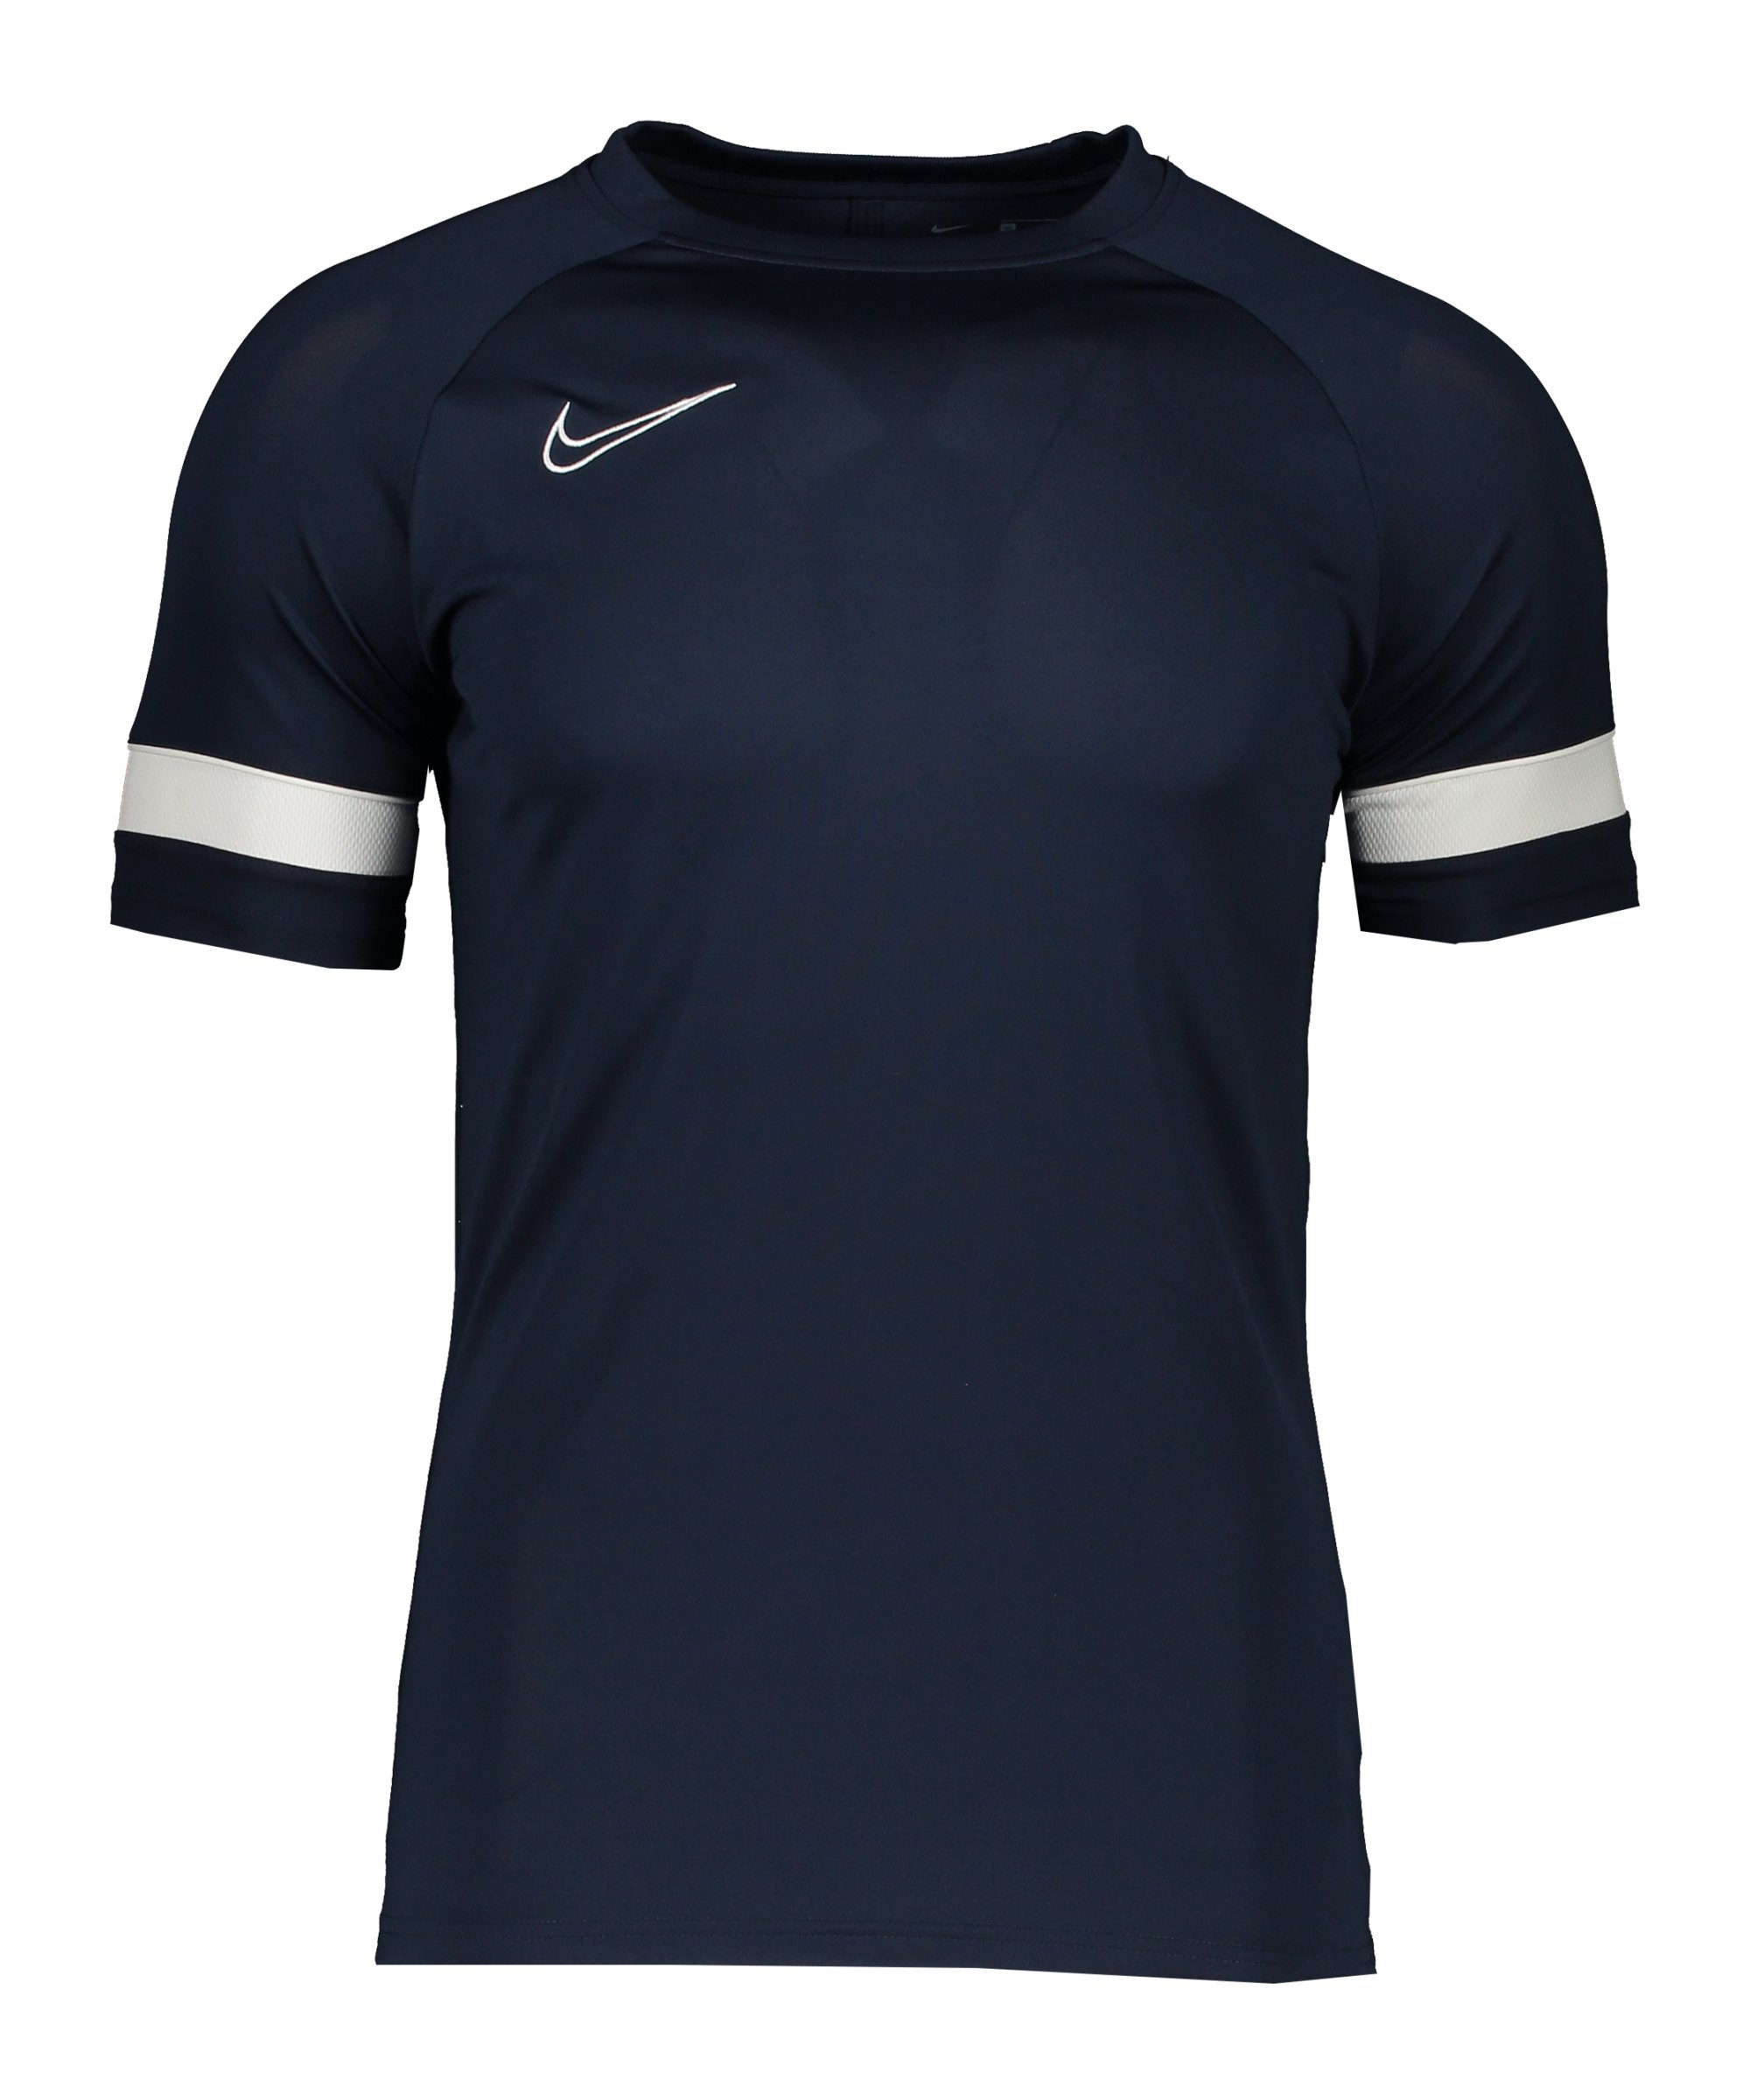 Nike Academy 21 T-Shirt Kids Blau F451 - blau